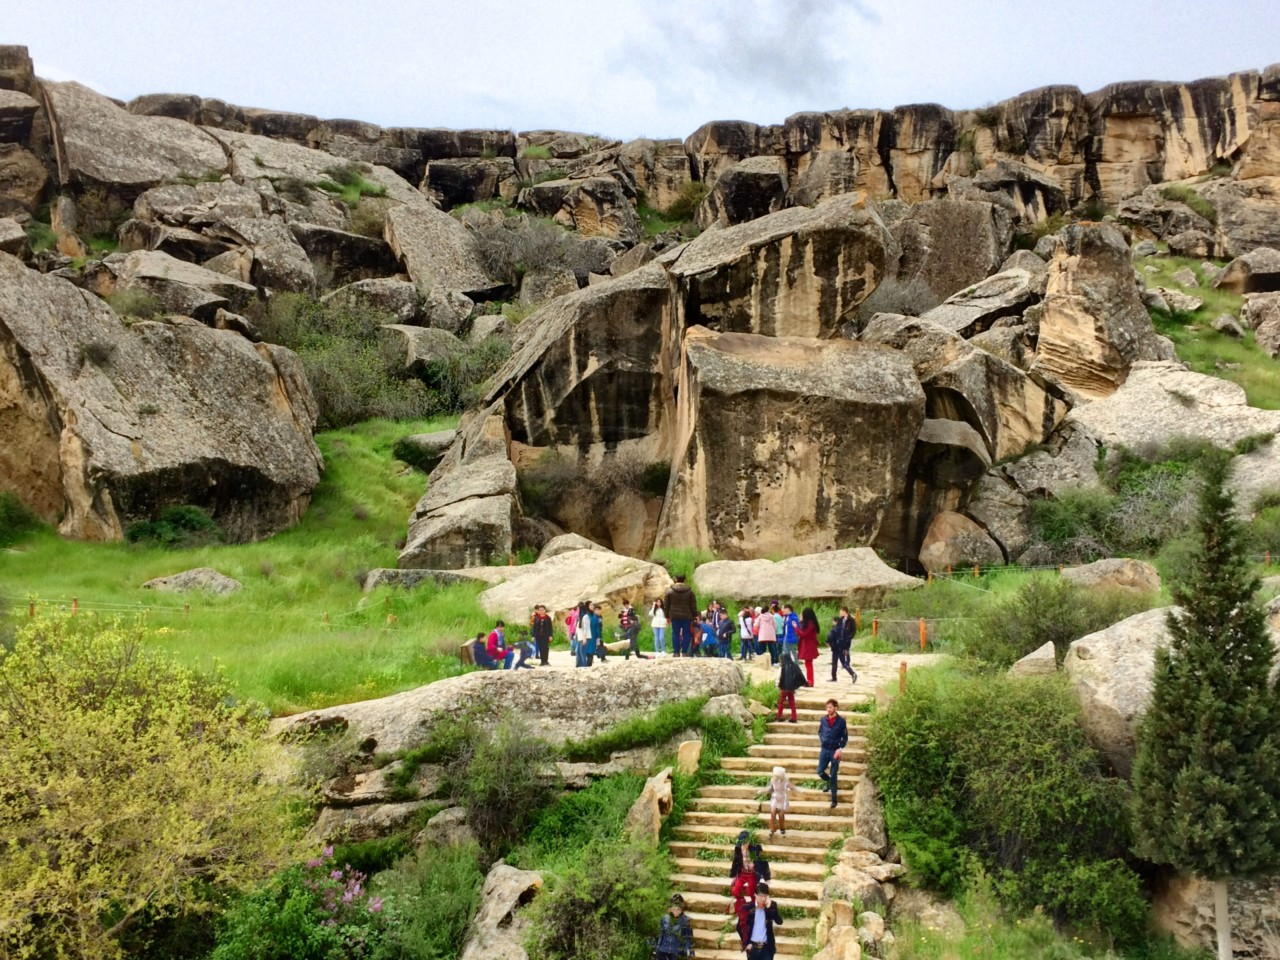 Gobustan petroglyph site